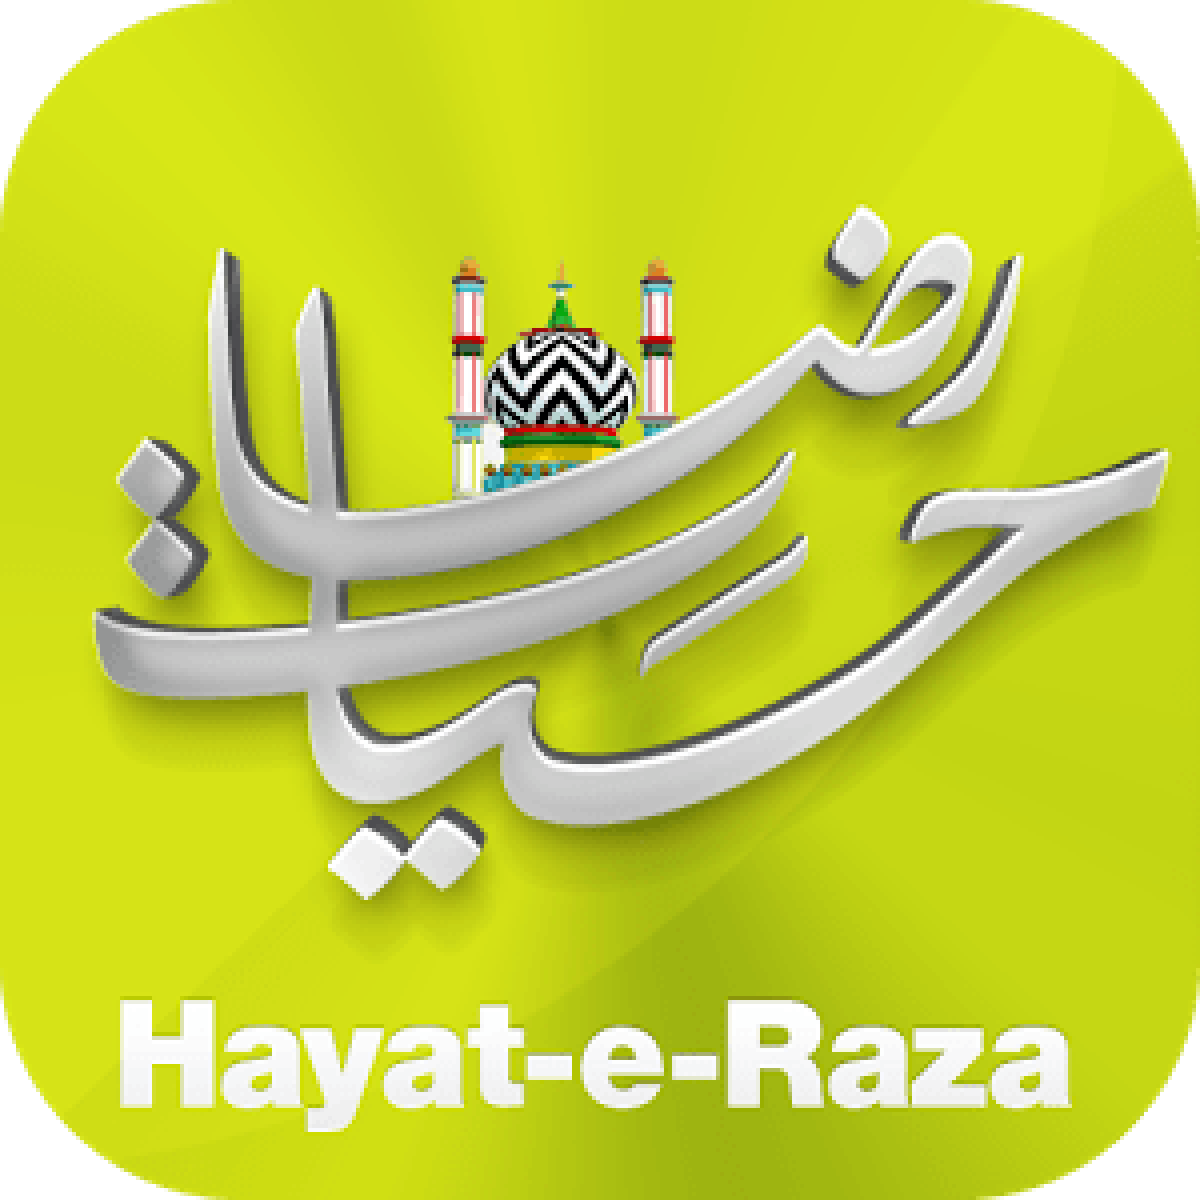 Hayat-e-Raza